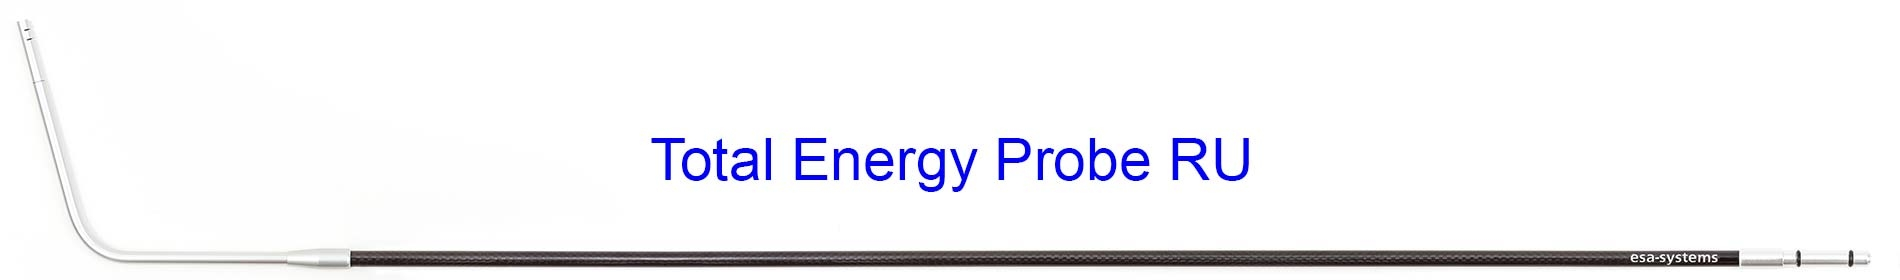 Total Energy Probe RU